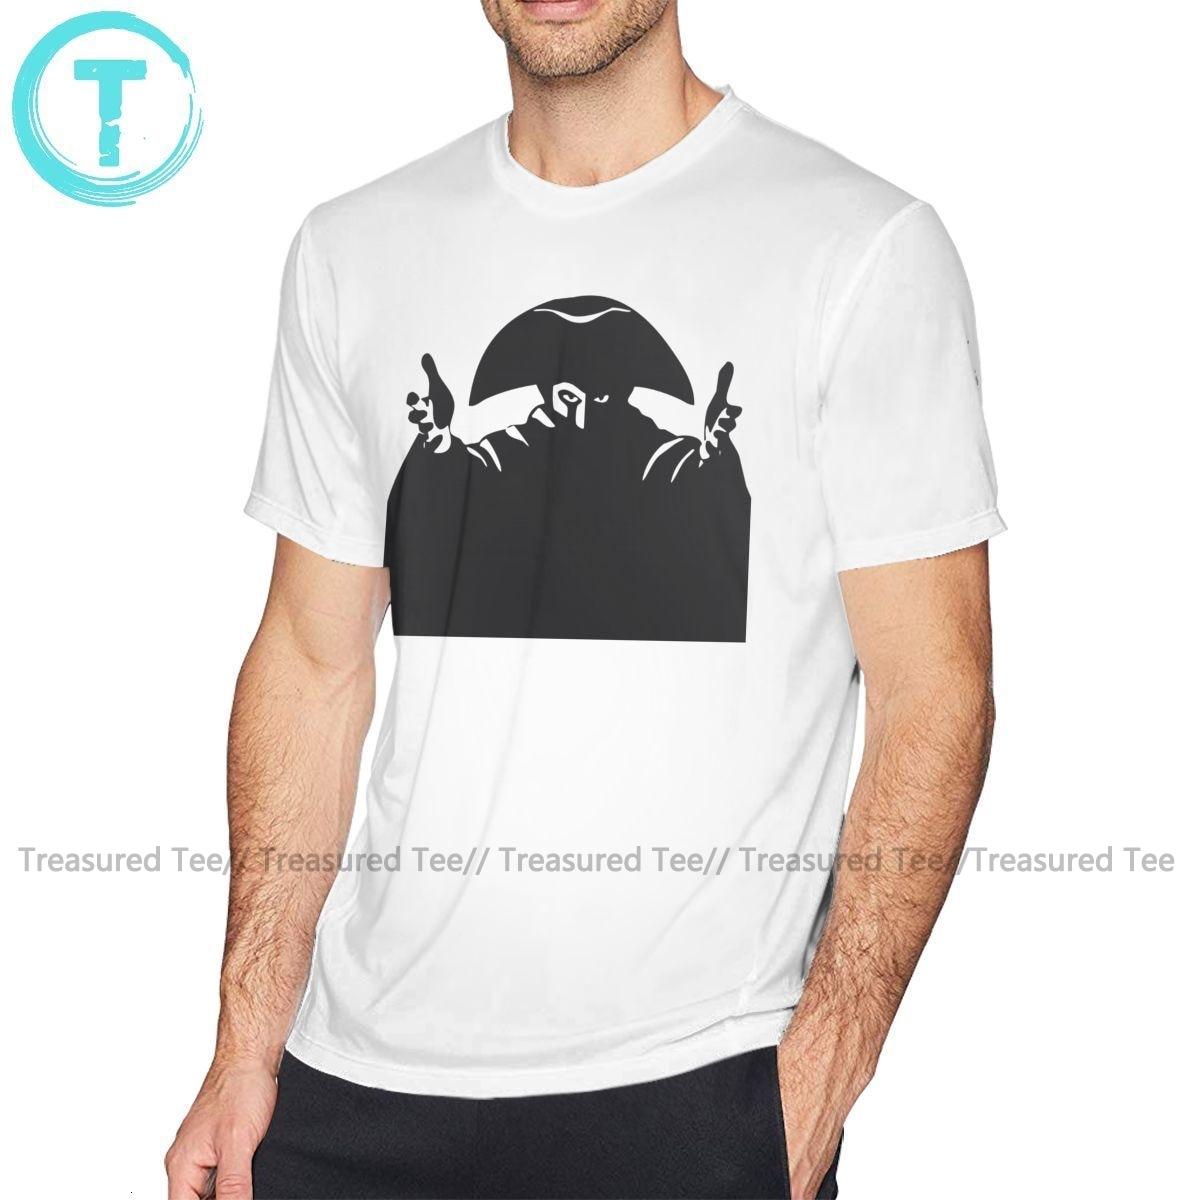 Camiseta con estampado de Kevin Gates, camiseta Amadeus, Linda Camiseta de manga corta para hombre, camiseta de gran tamaño 100 algodón